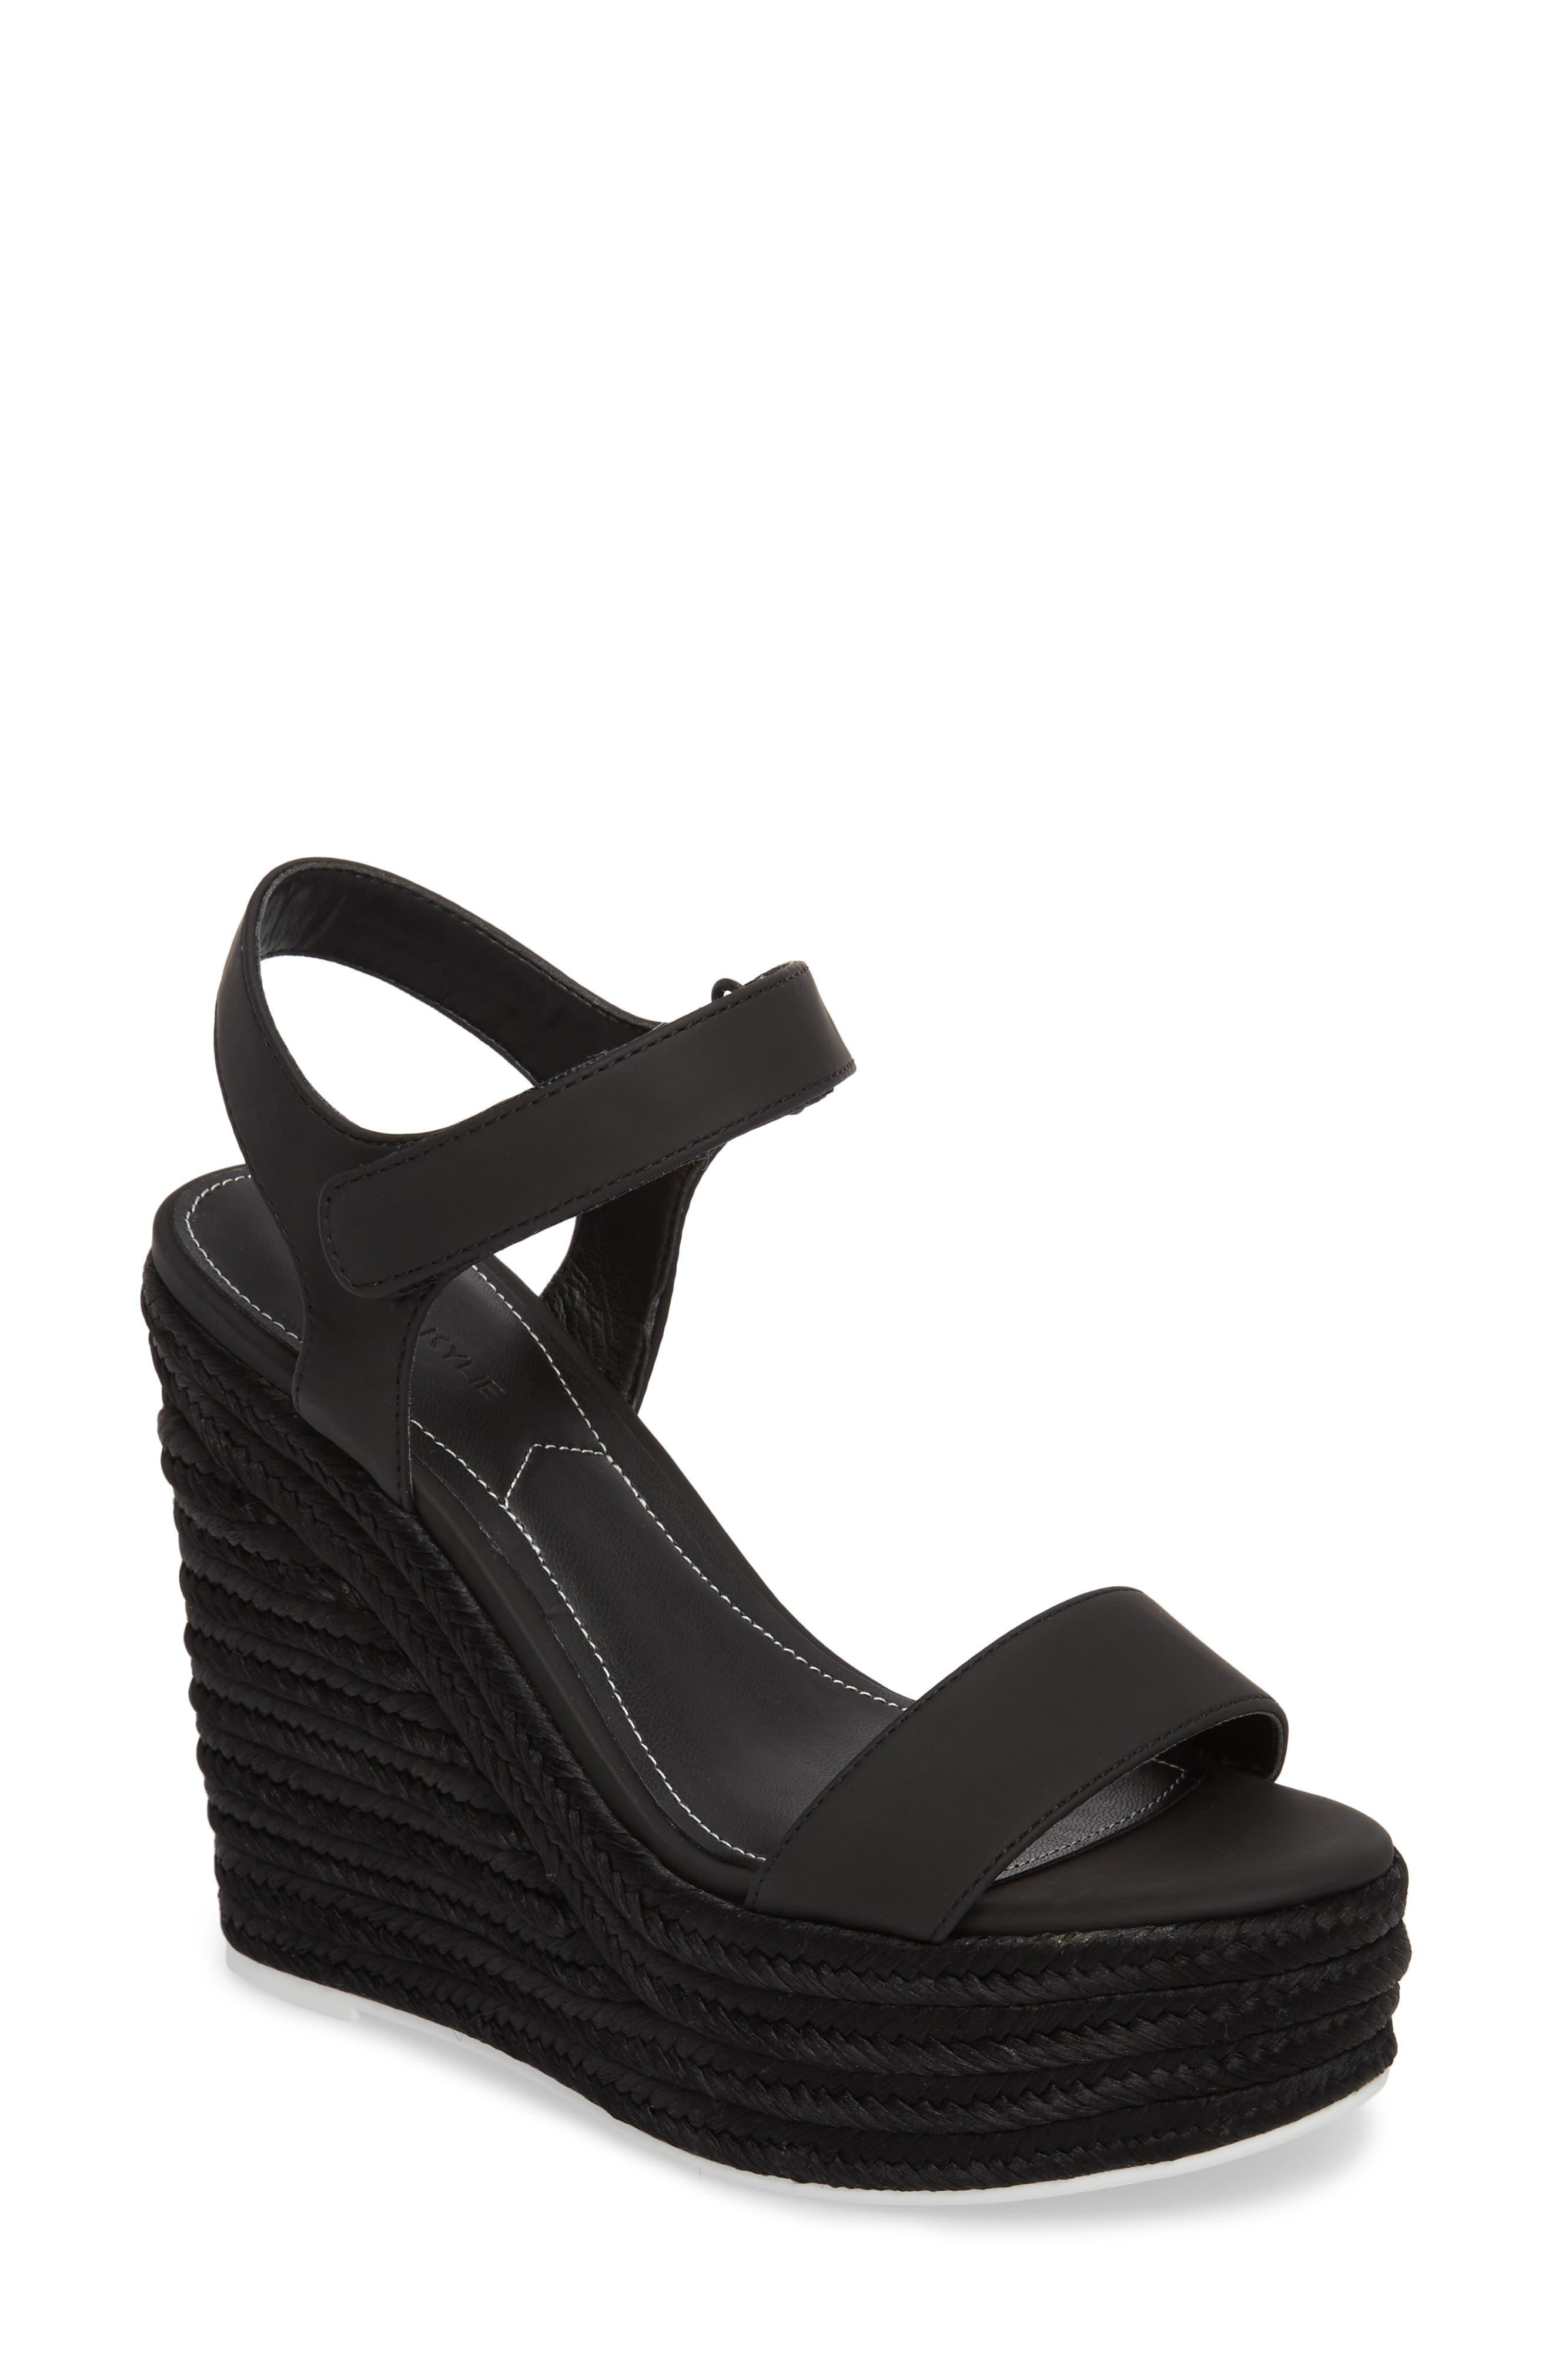 Grand Sport Espadrille Wedge Sandal,                         Main,                         color, BLACK